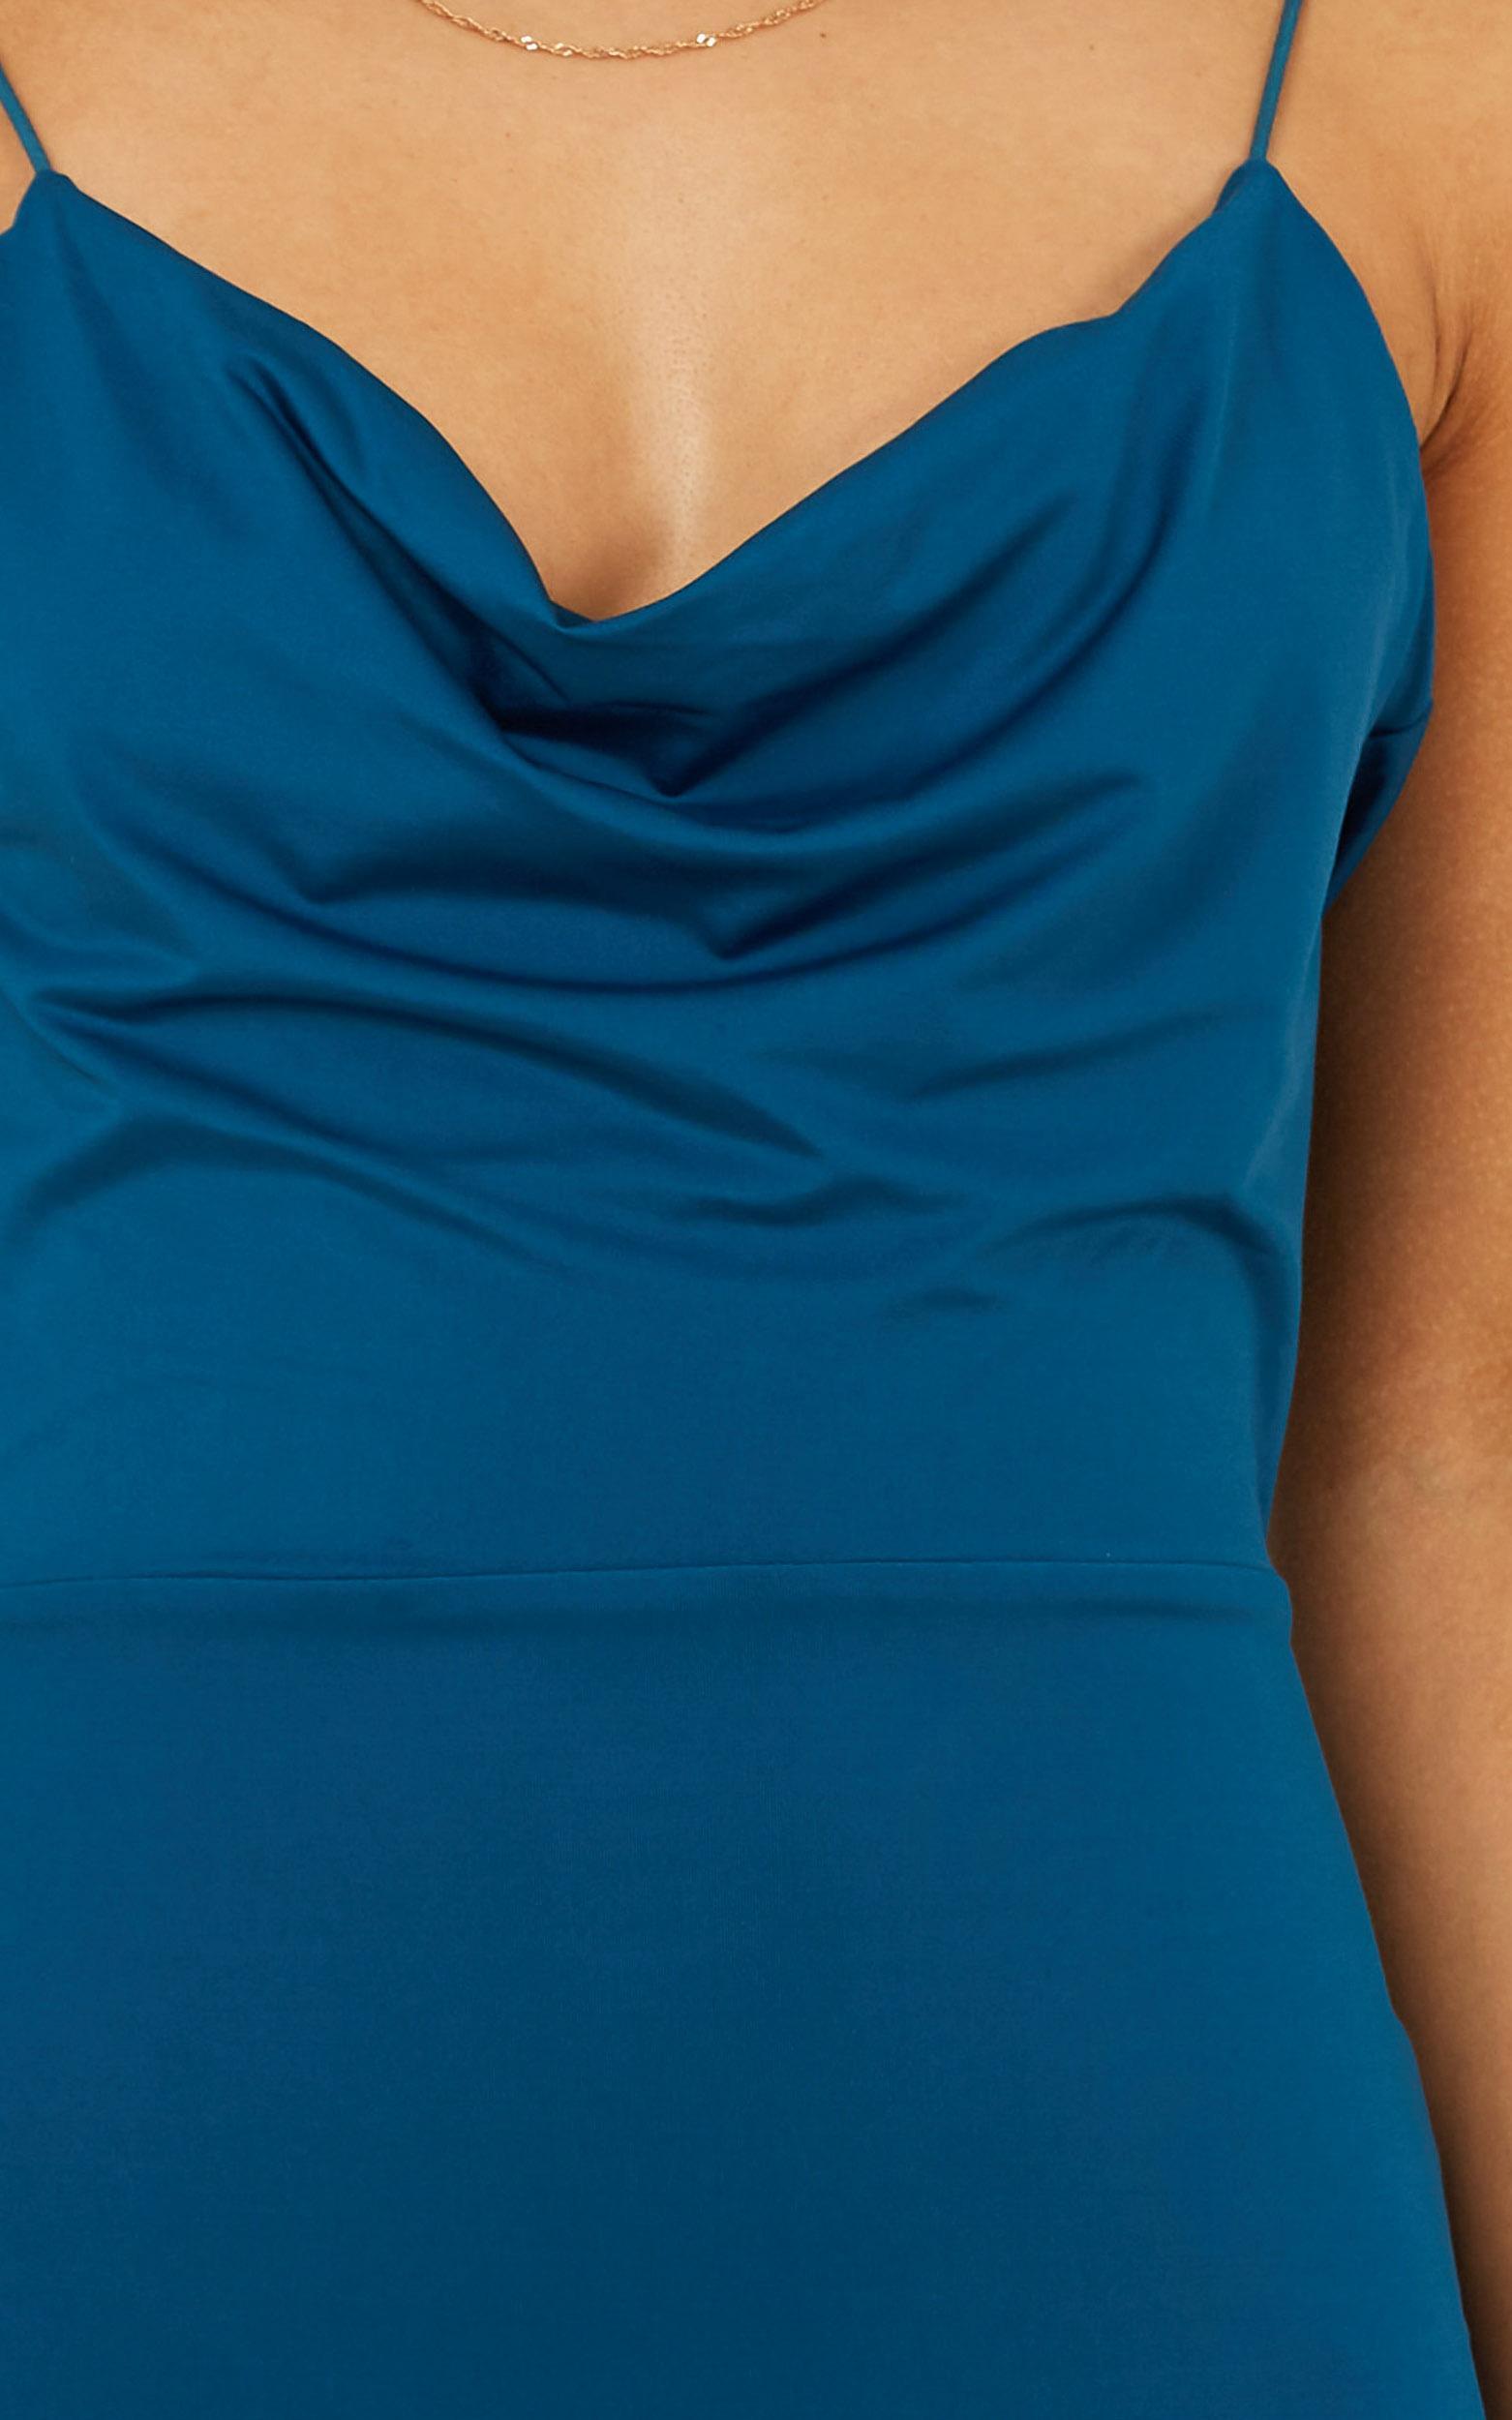 Tasteful dress in teal - 20 (XXXXL), Blue, hi-res image number null